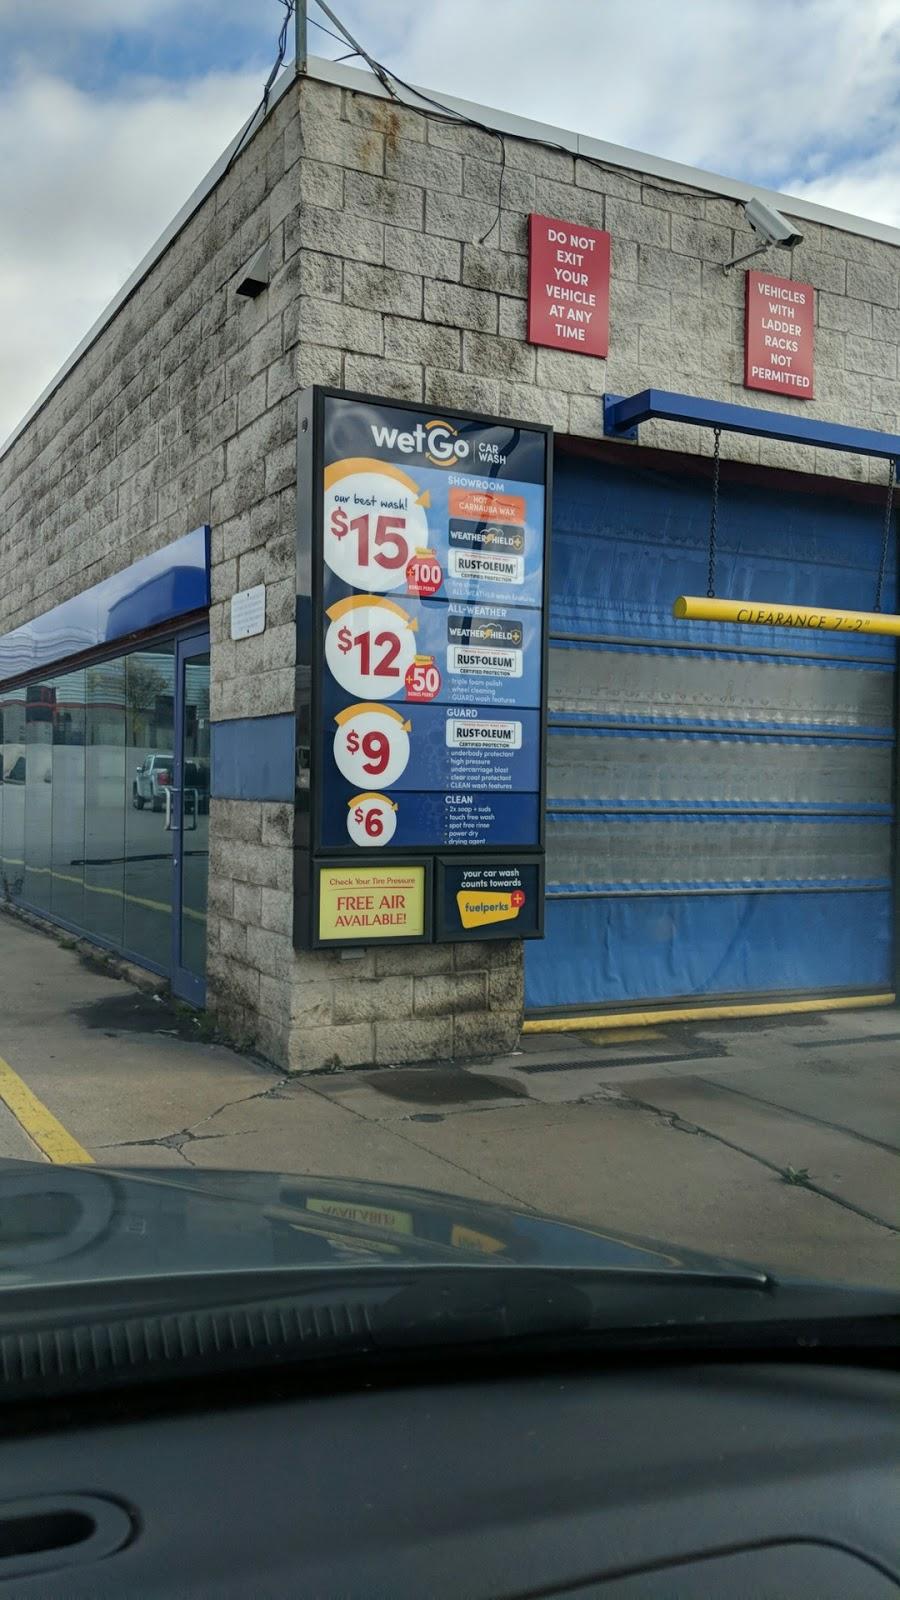 GetGo Gas Station & WetGo Car Wash - gas station    Photo 10 of 10   Address: 1001 Lebanon Rd, West Mifflin, PA 15122, USA   Phone: (412) 461-2114